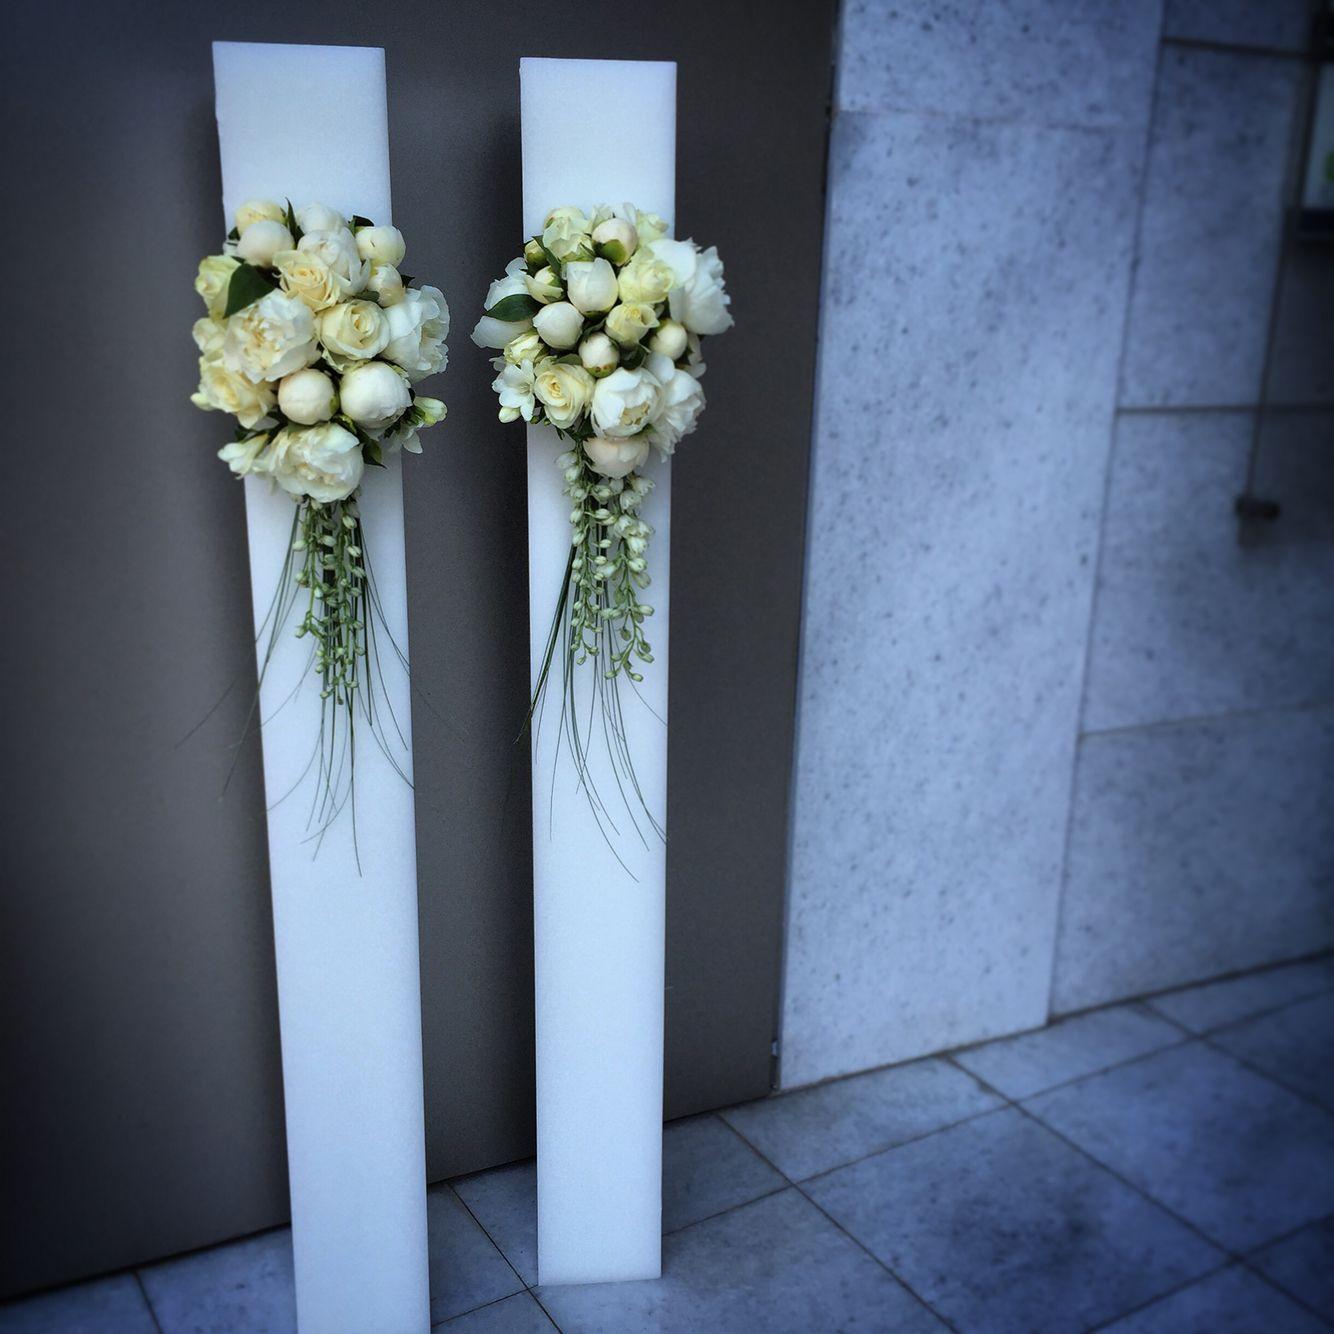 13db674c7c63 Λαμπάδες γάμου wedding candles Γαμήλιες Προσκλήσεις